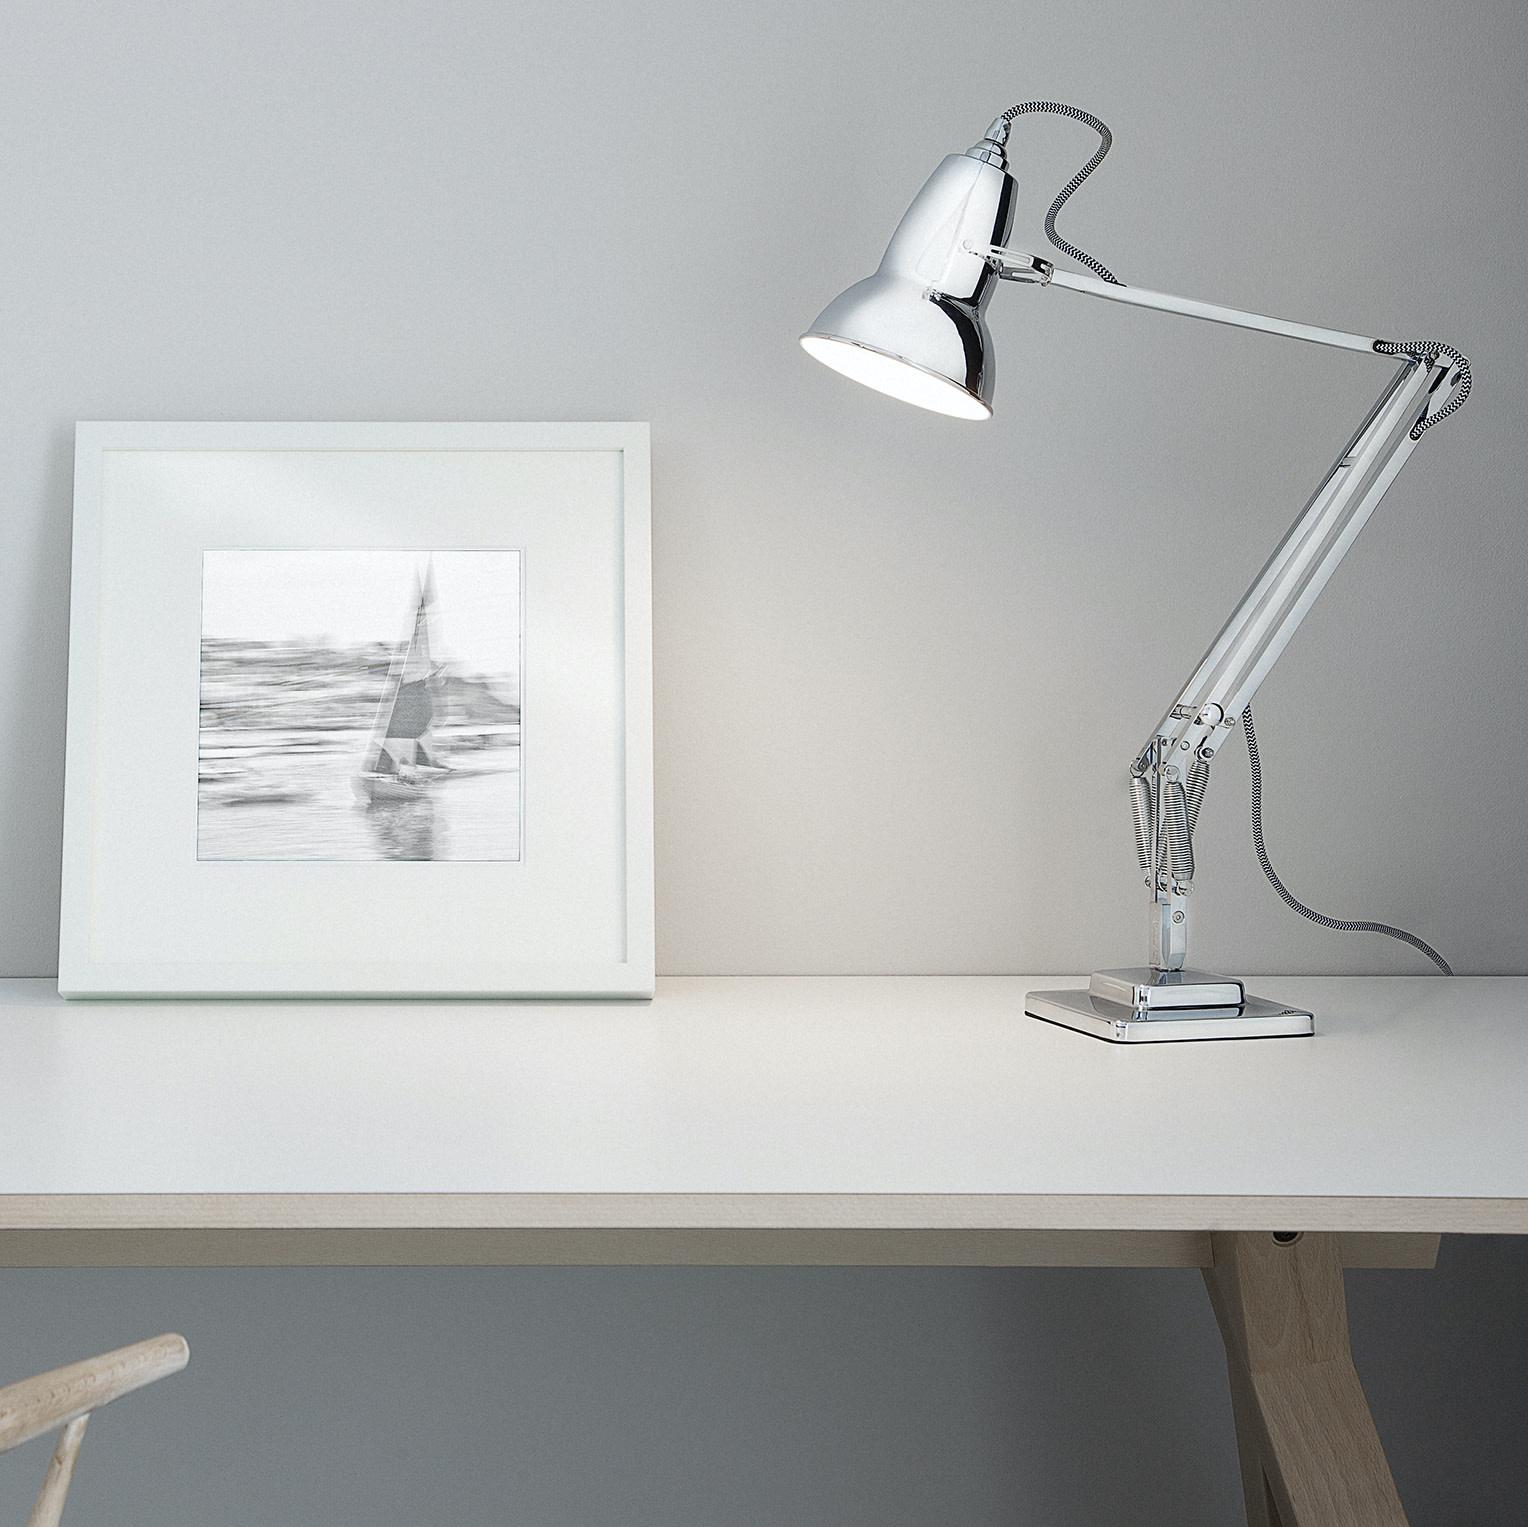 Anglepoise PREORDER Original 1227 Desk Lamp - Bright Chrome Finish